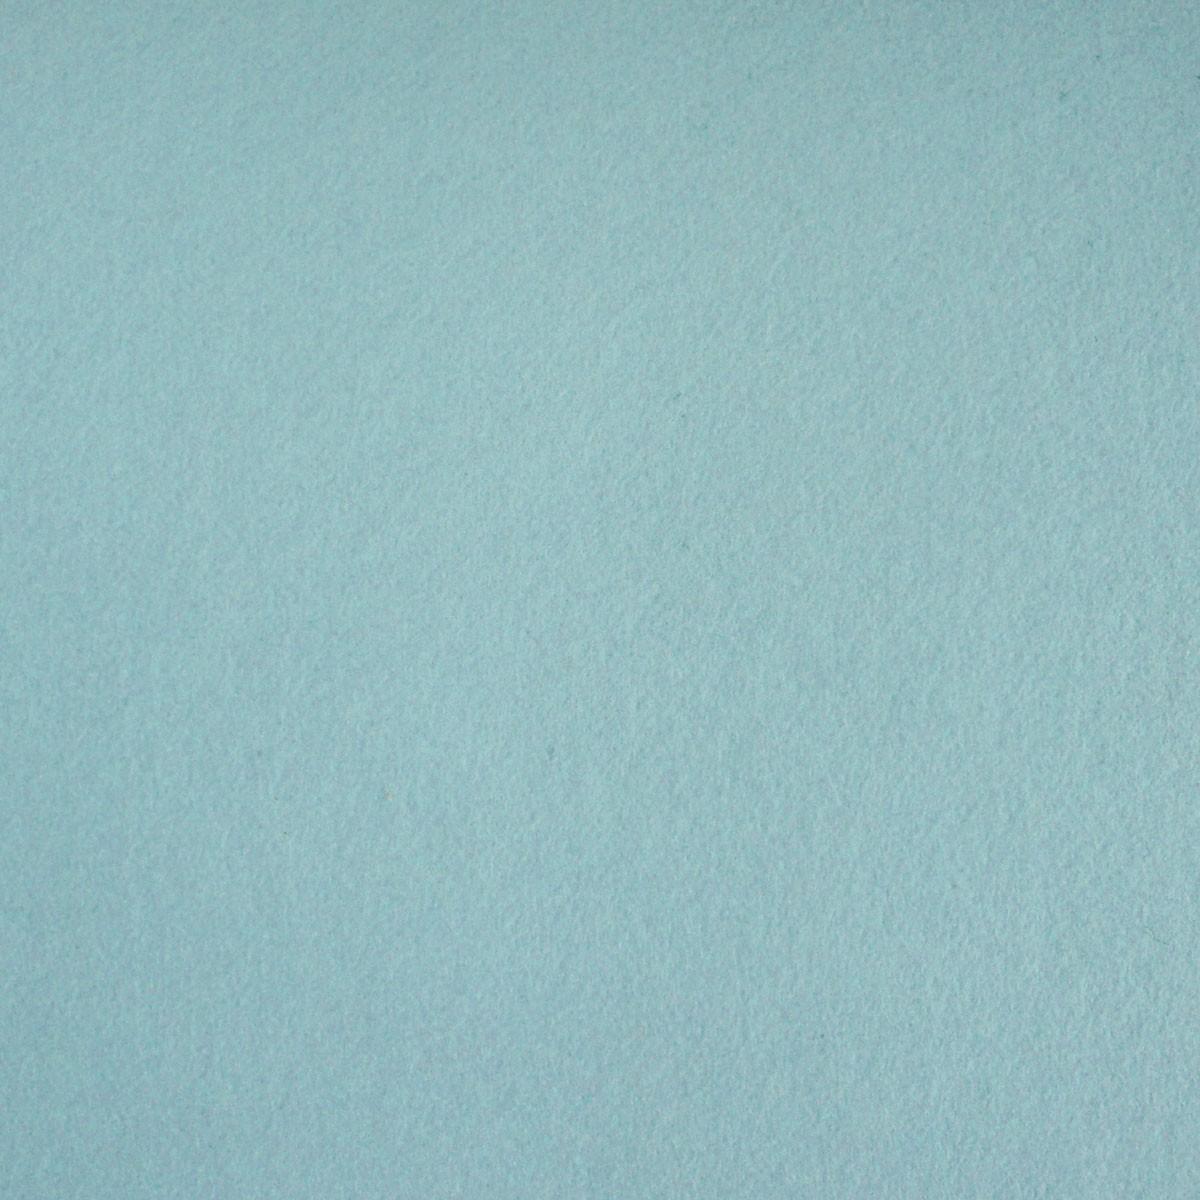 Kreativstoff Bastelfilz einfarbig hellblau 45cm Breite 4mm Stärke